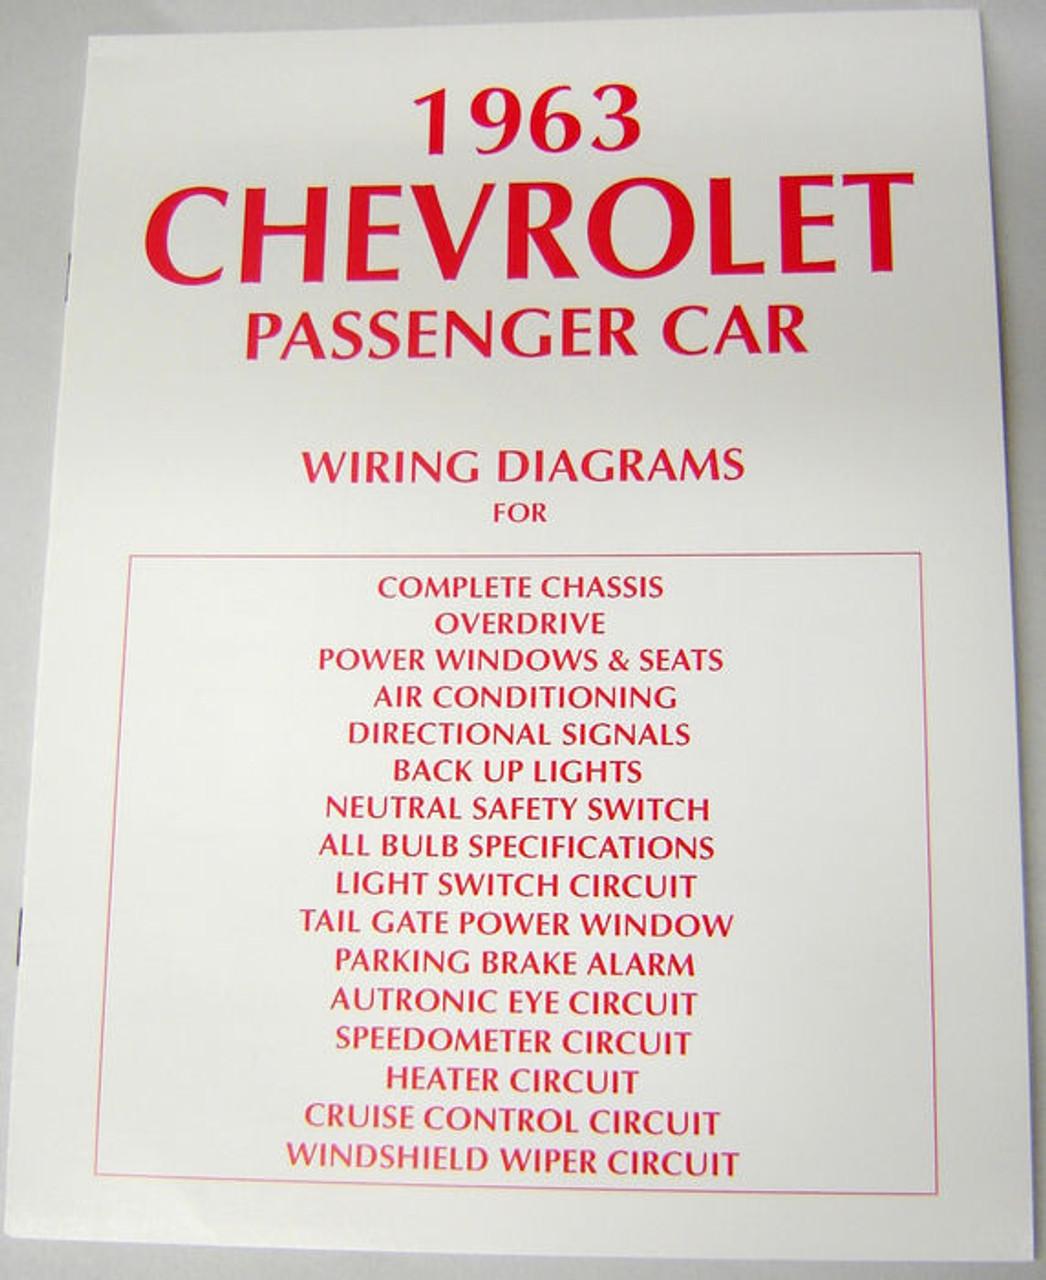 [QNCB_7524]  63 Chevy Impala Electrical Wiring Diagram Manual 1963 - I-5 Classic Chevy | Impala Heater Wiring Diagram |  | I-5 Classic Chevy